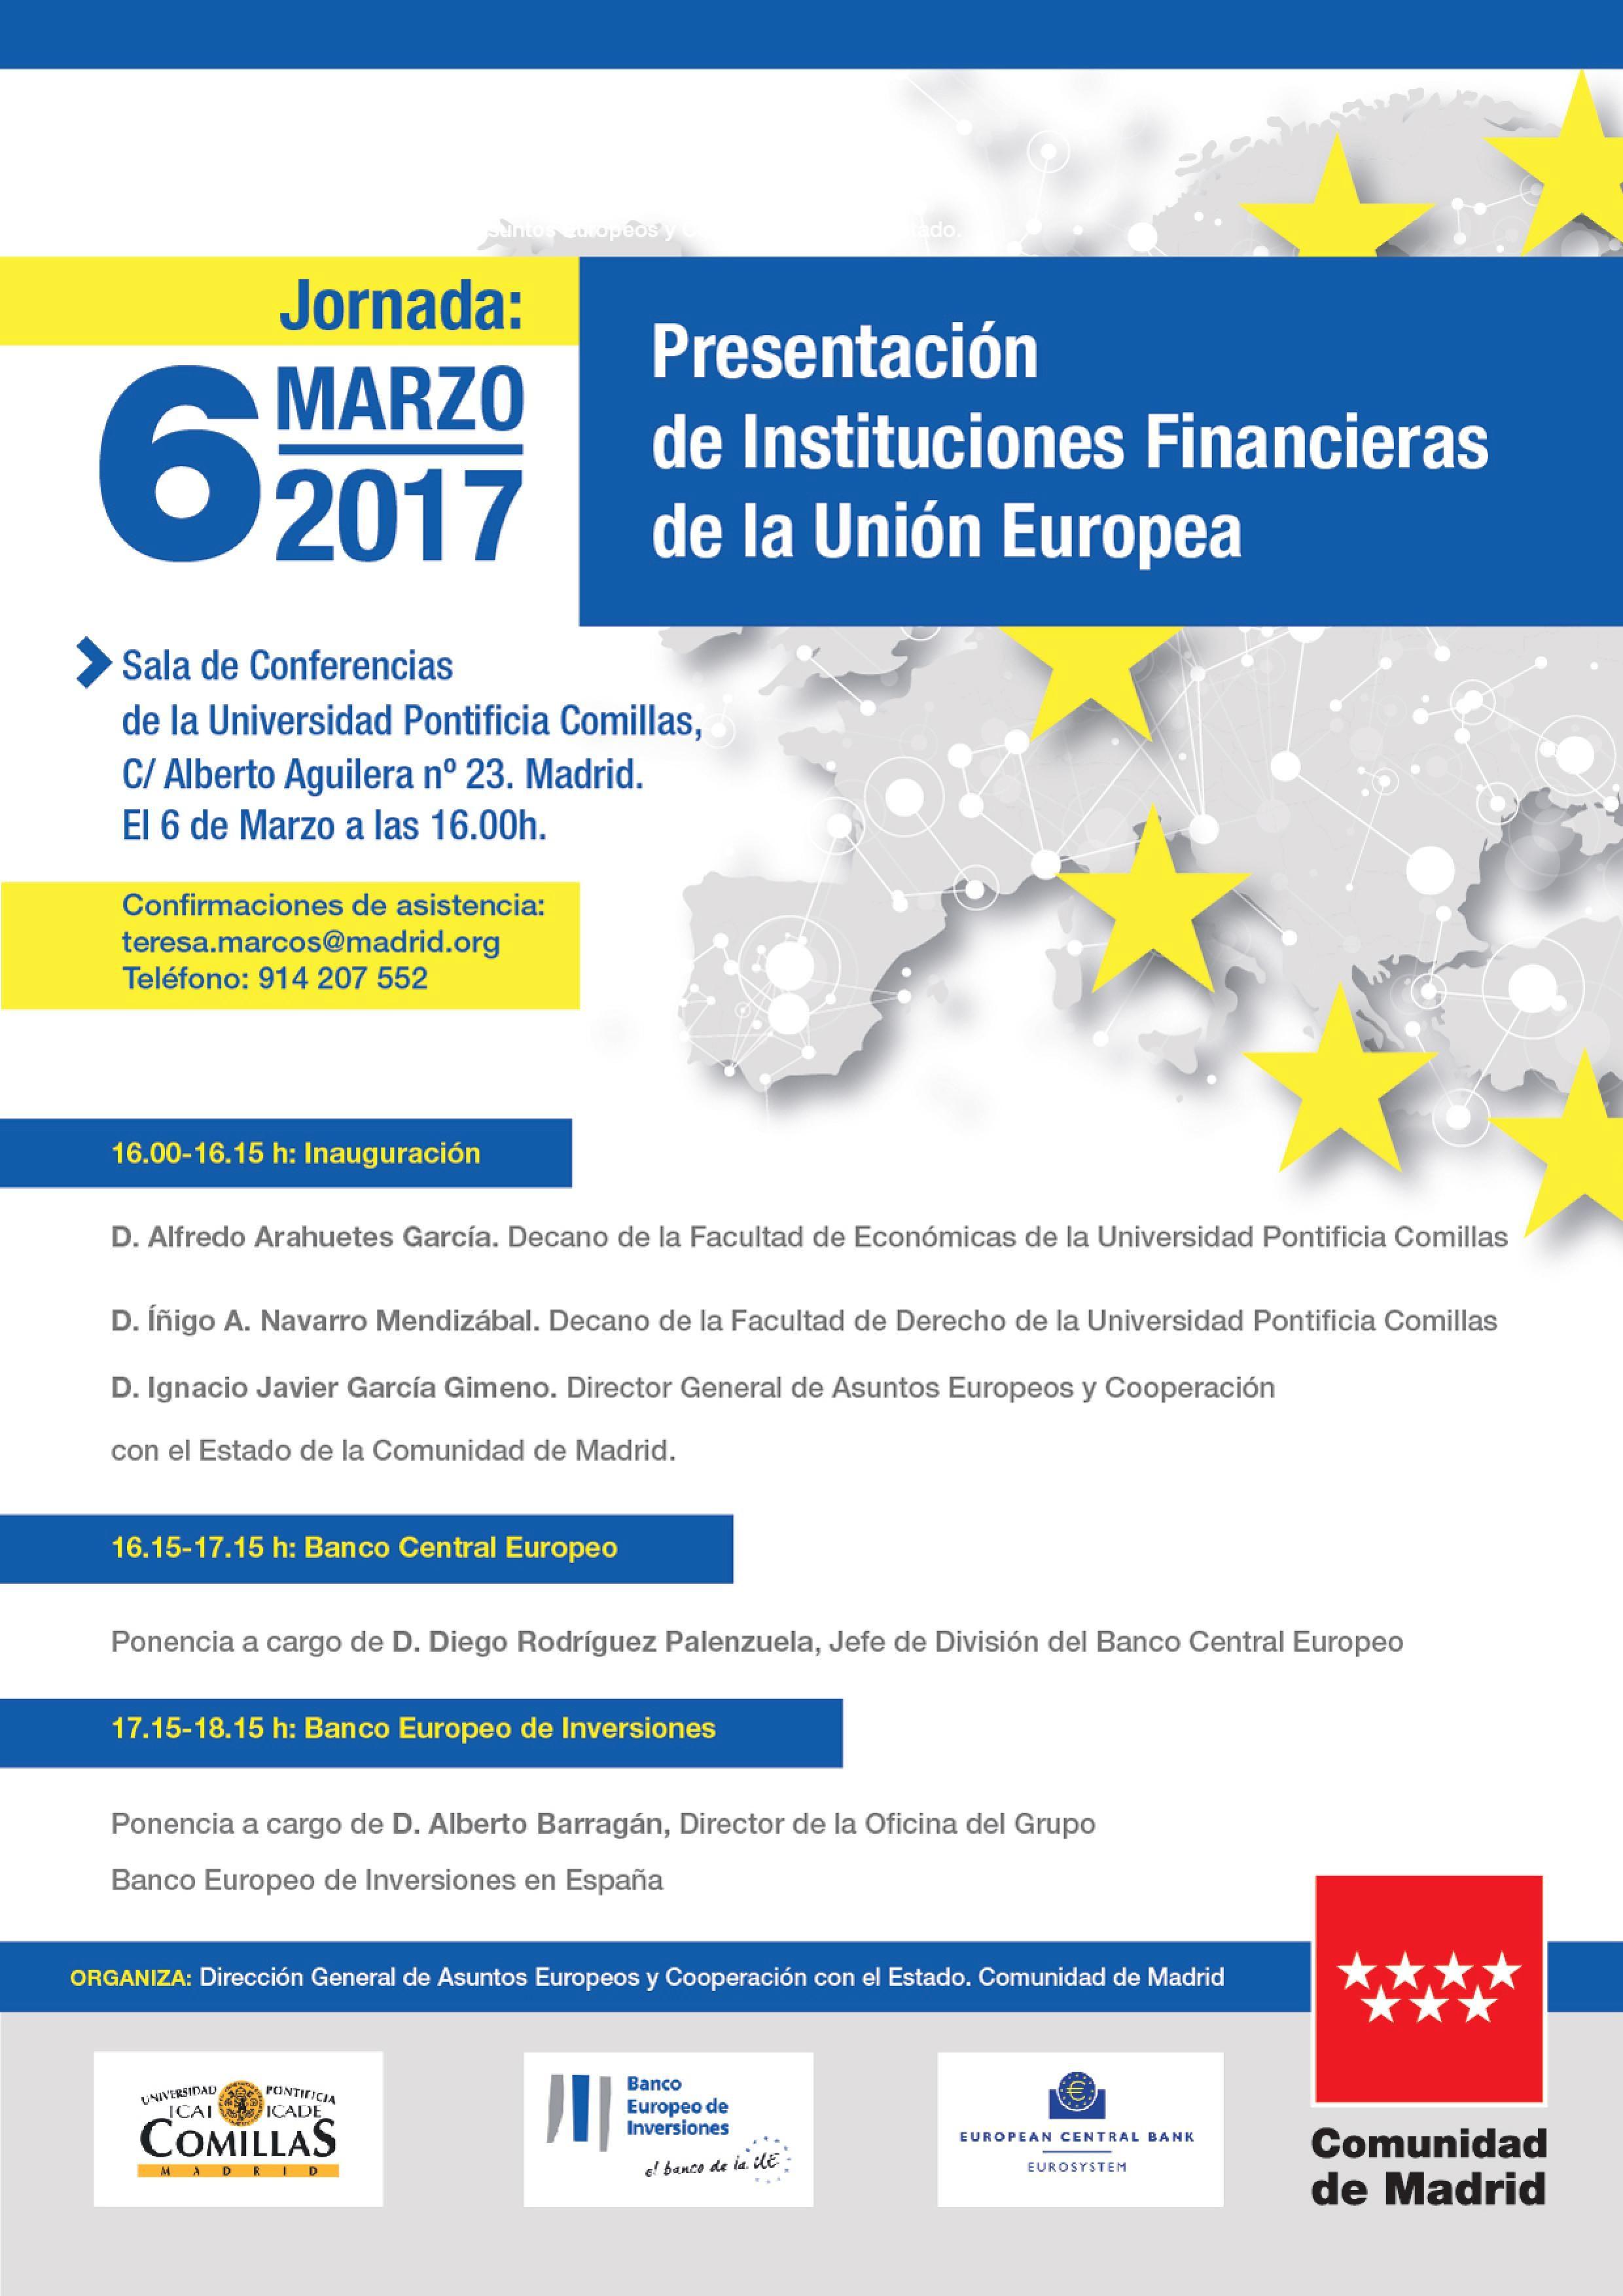 jonadas presentacion instituciones financieras de la union europea